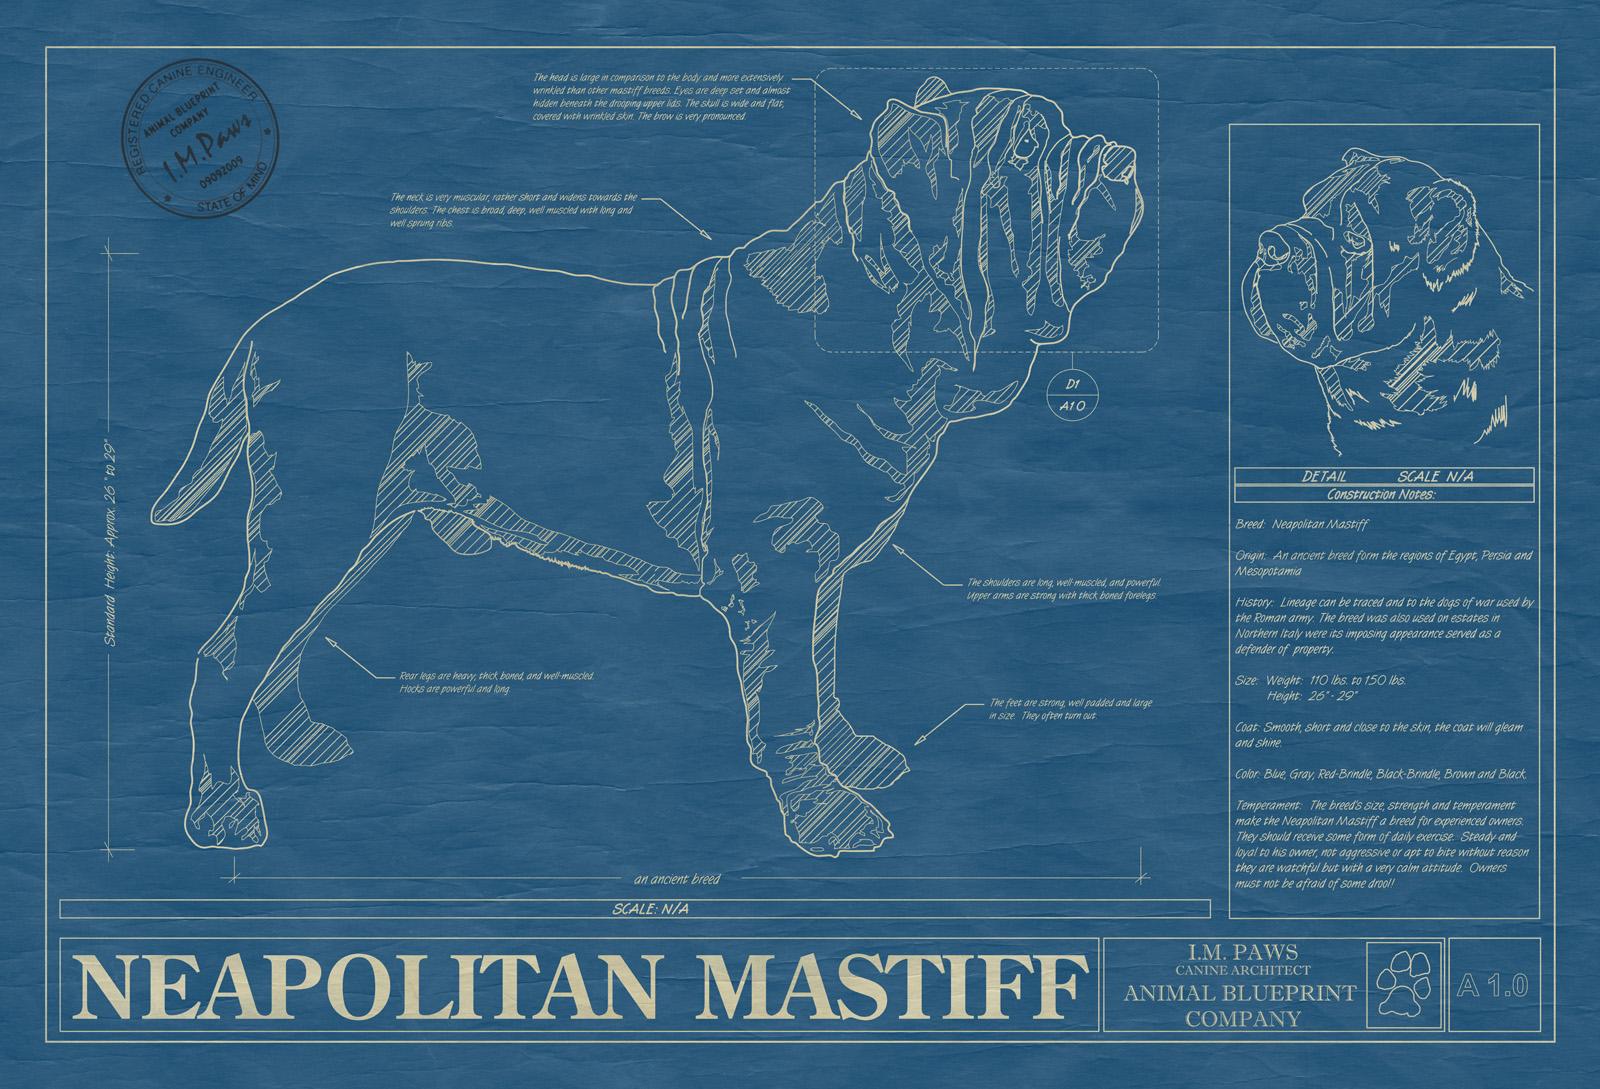 Neapolitan mastiff animal blueprint company neapolitan mastiff dog blueprint malvernweather Choice Image